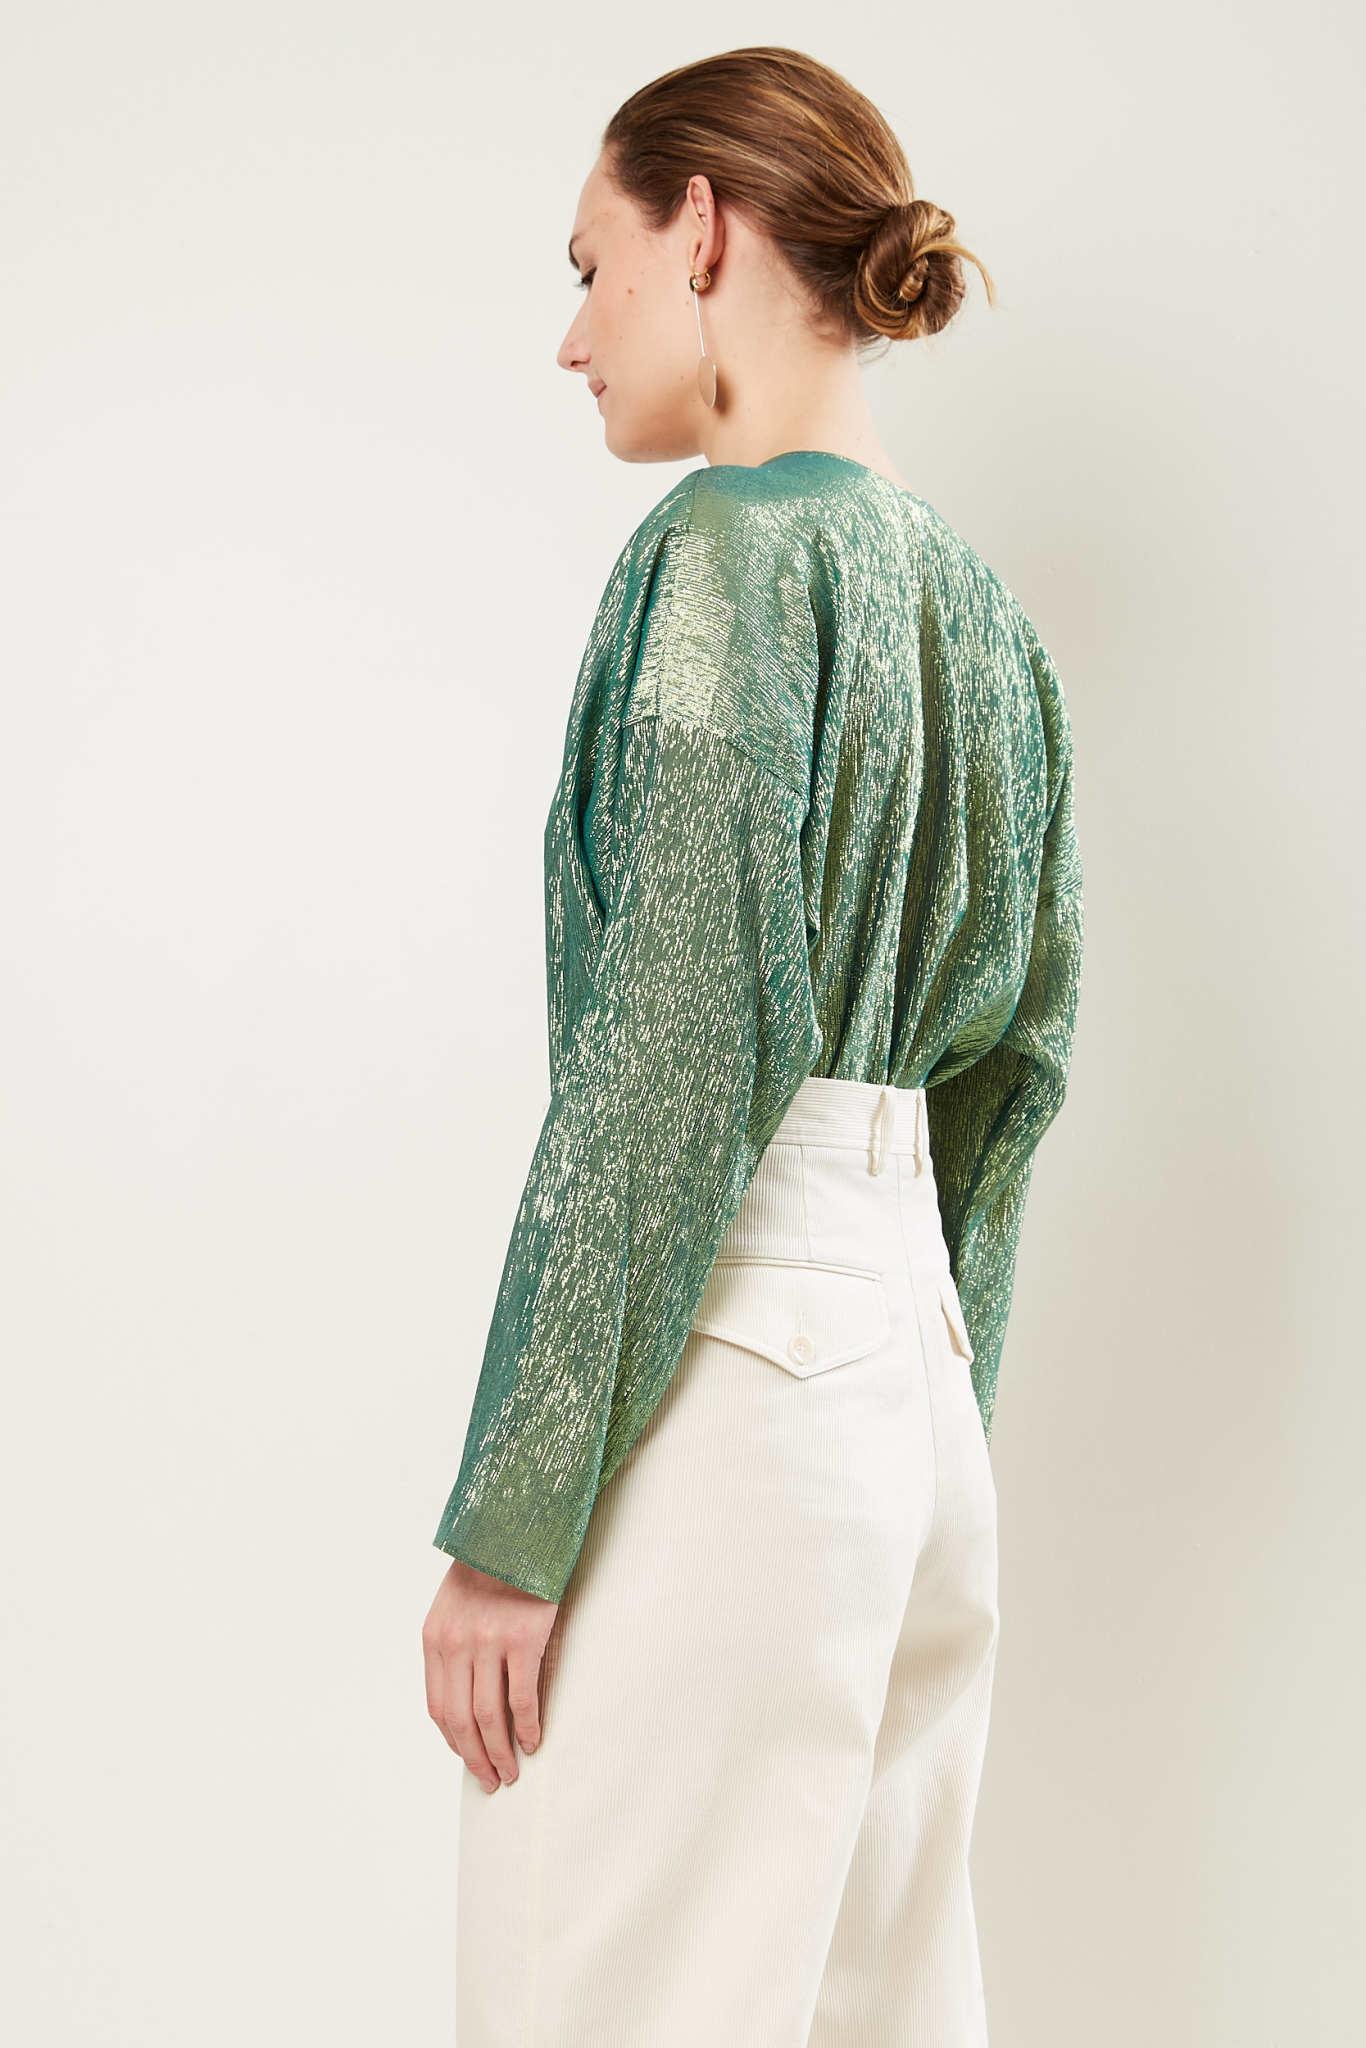 inDRESS - Sparkling v-neck blouse